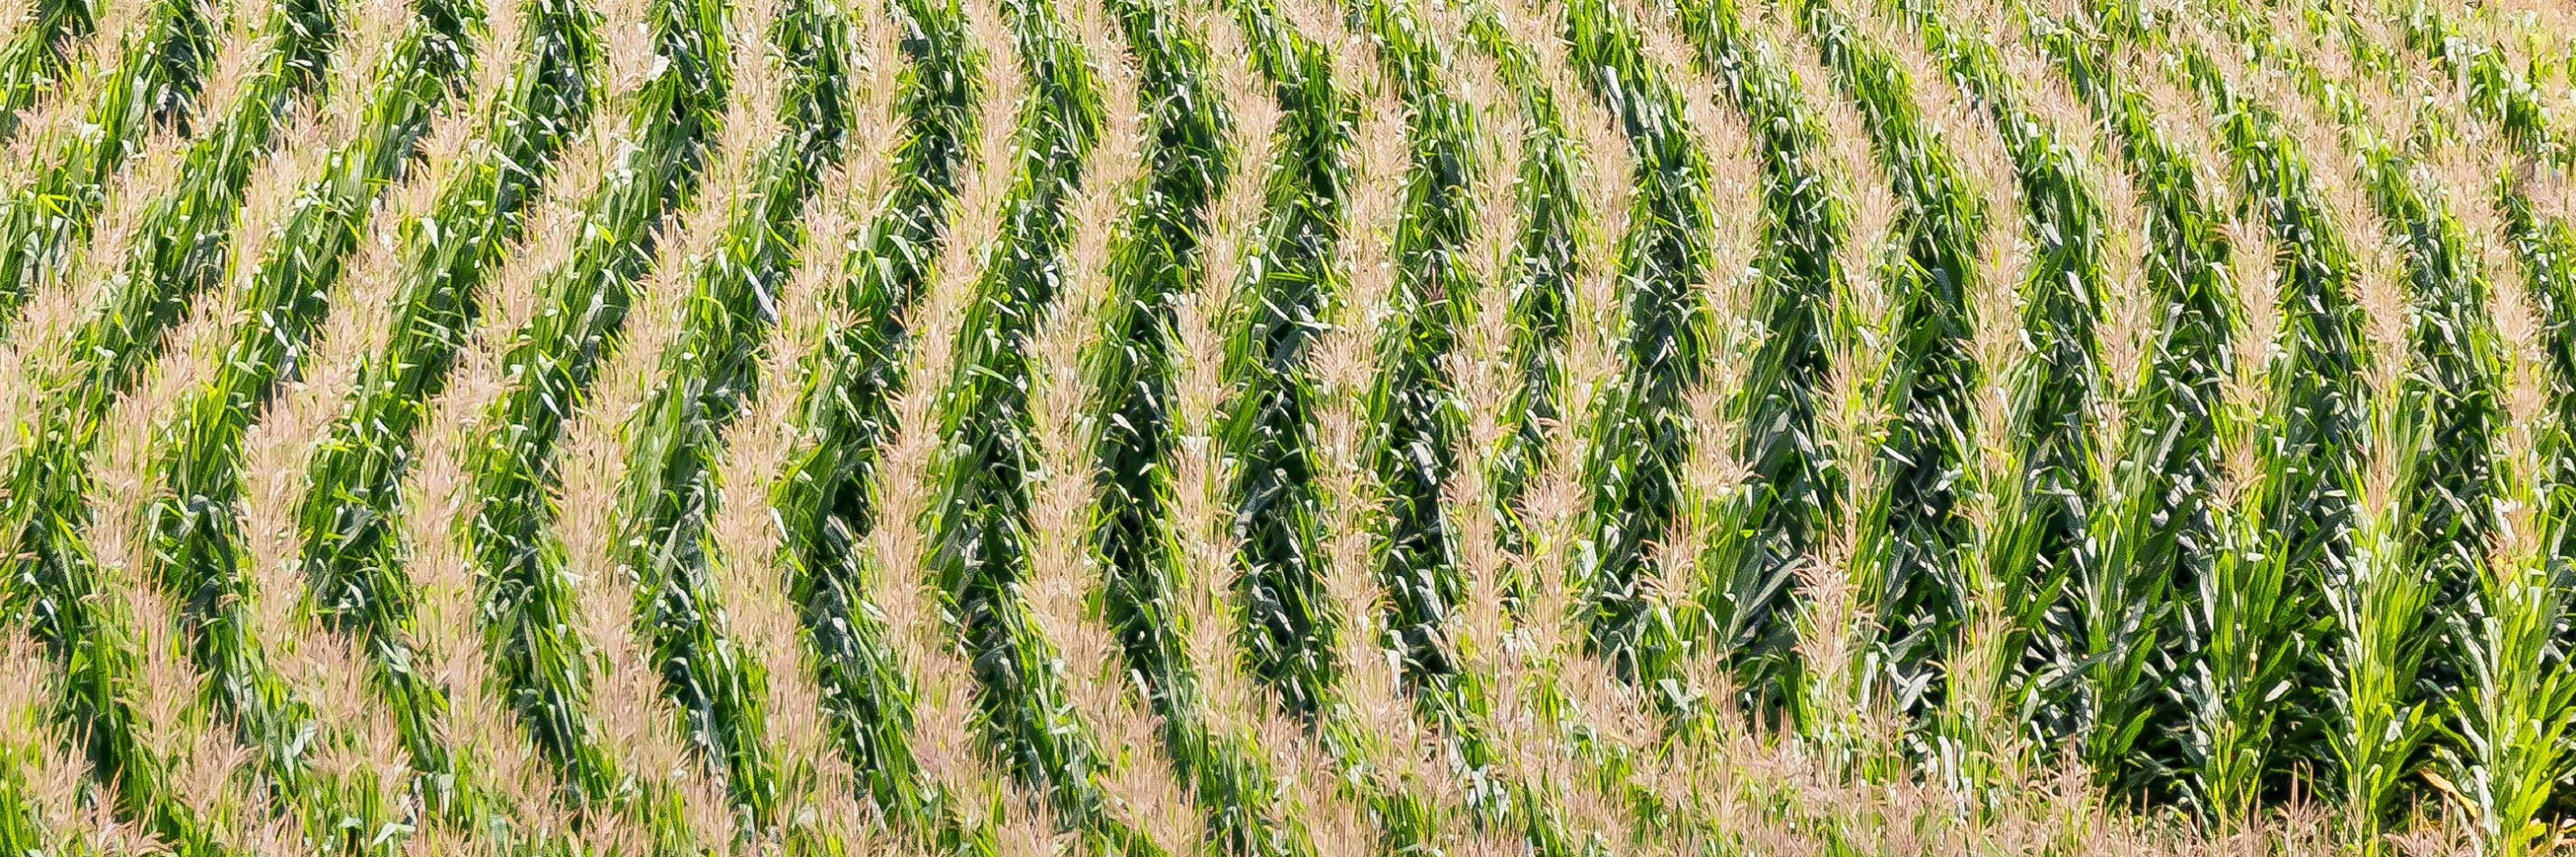 gw-fact-corn